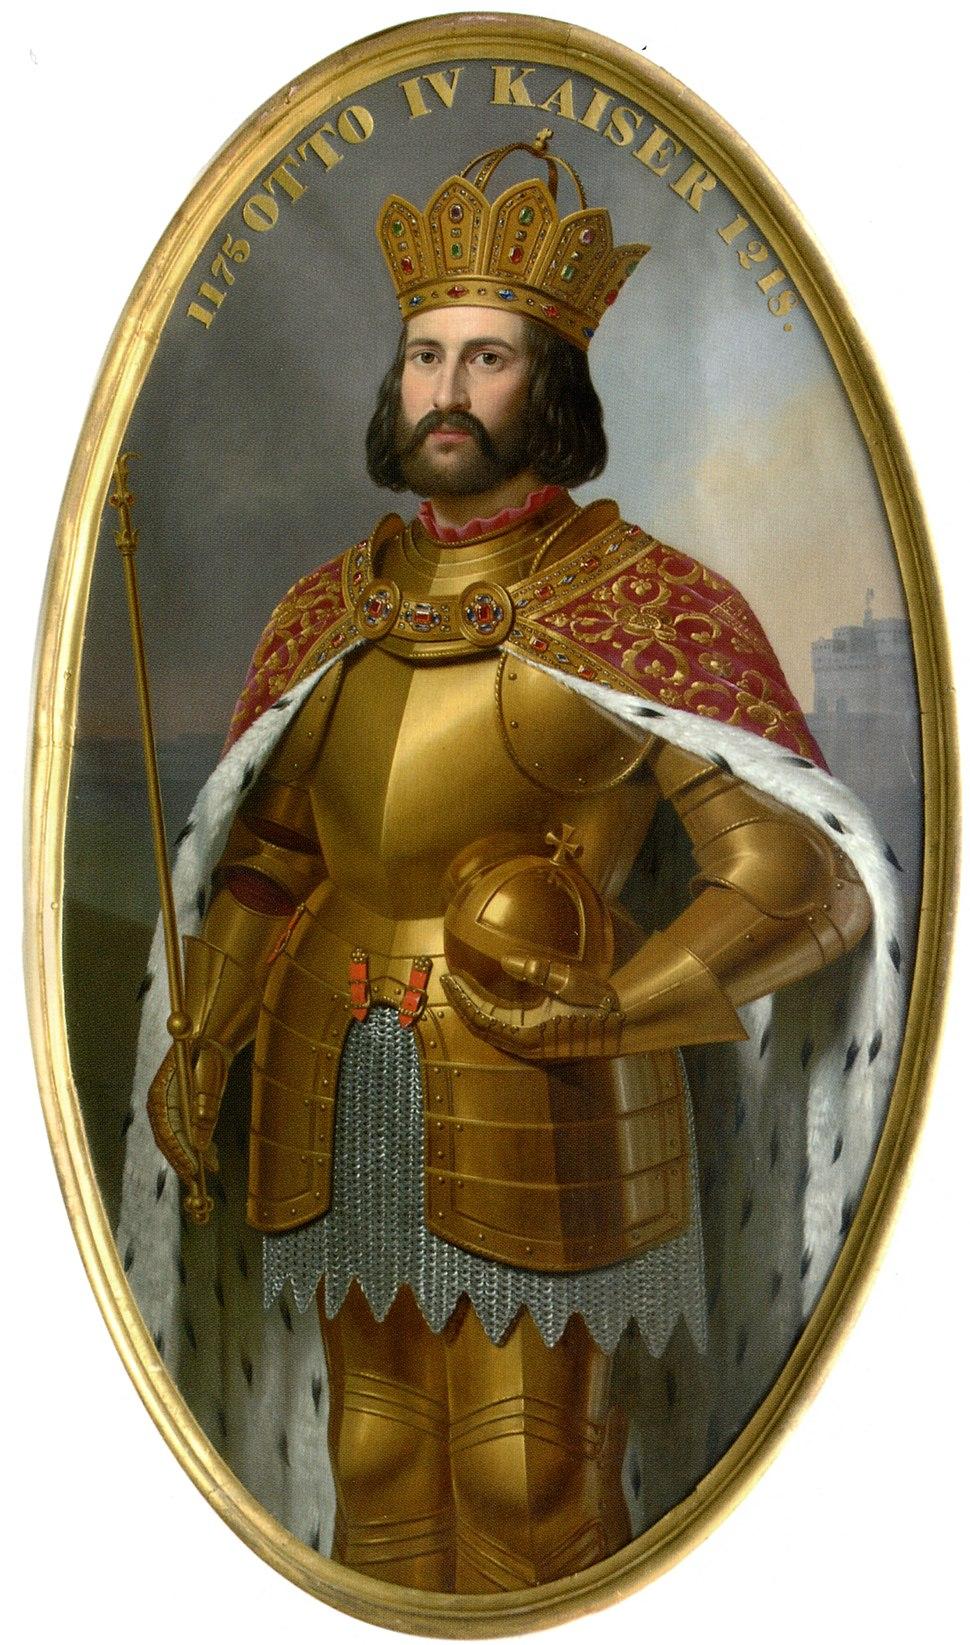 Otto IV 1836